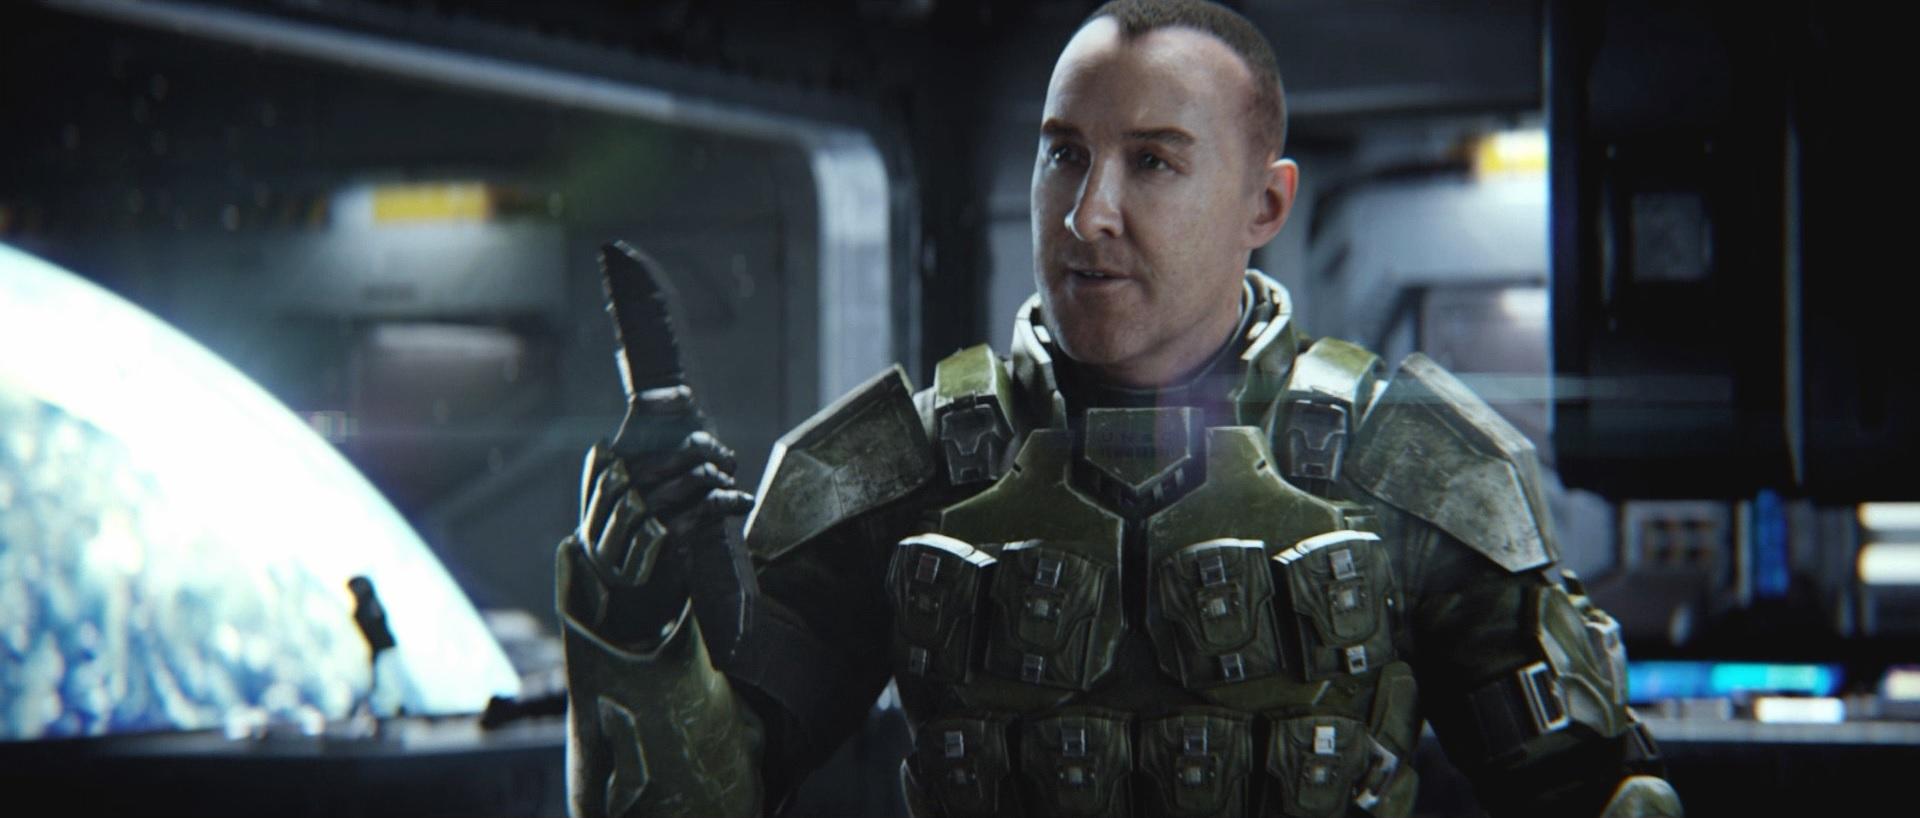 Master Gunnery Sergeant Halo Nation Fandom Powered By